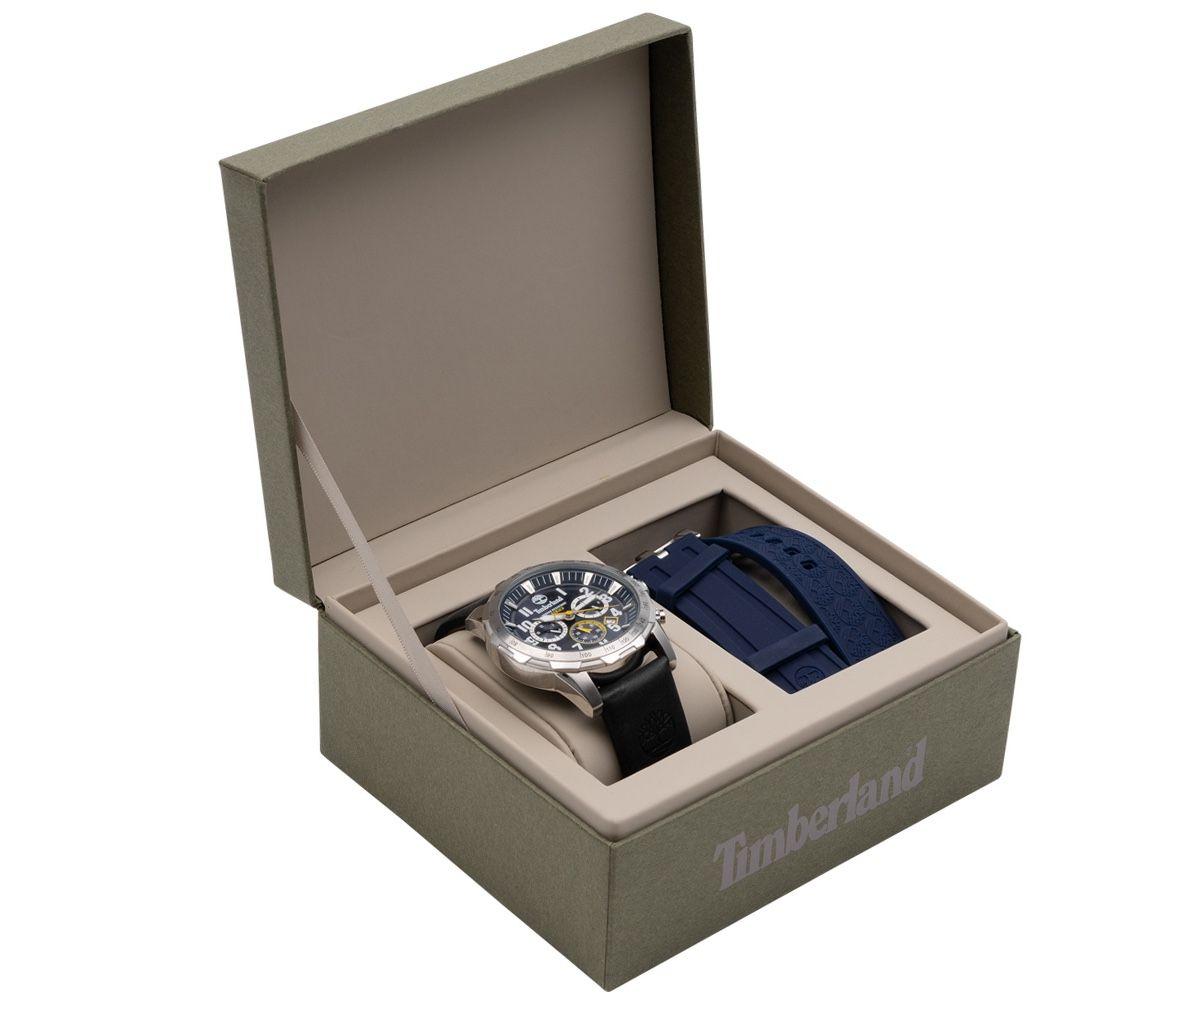 Timberland Westford Herren Analog Armbanduhr mit Leder Armband für 94,99€ (statt 189€)